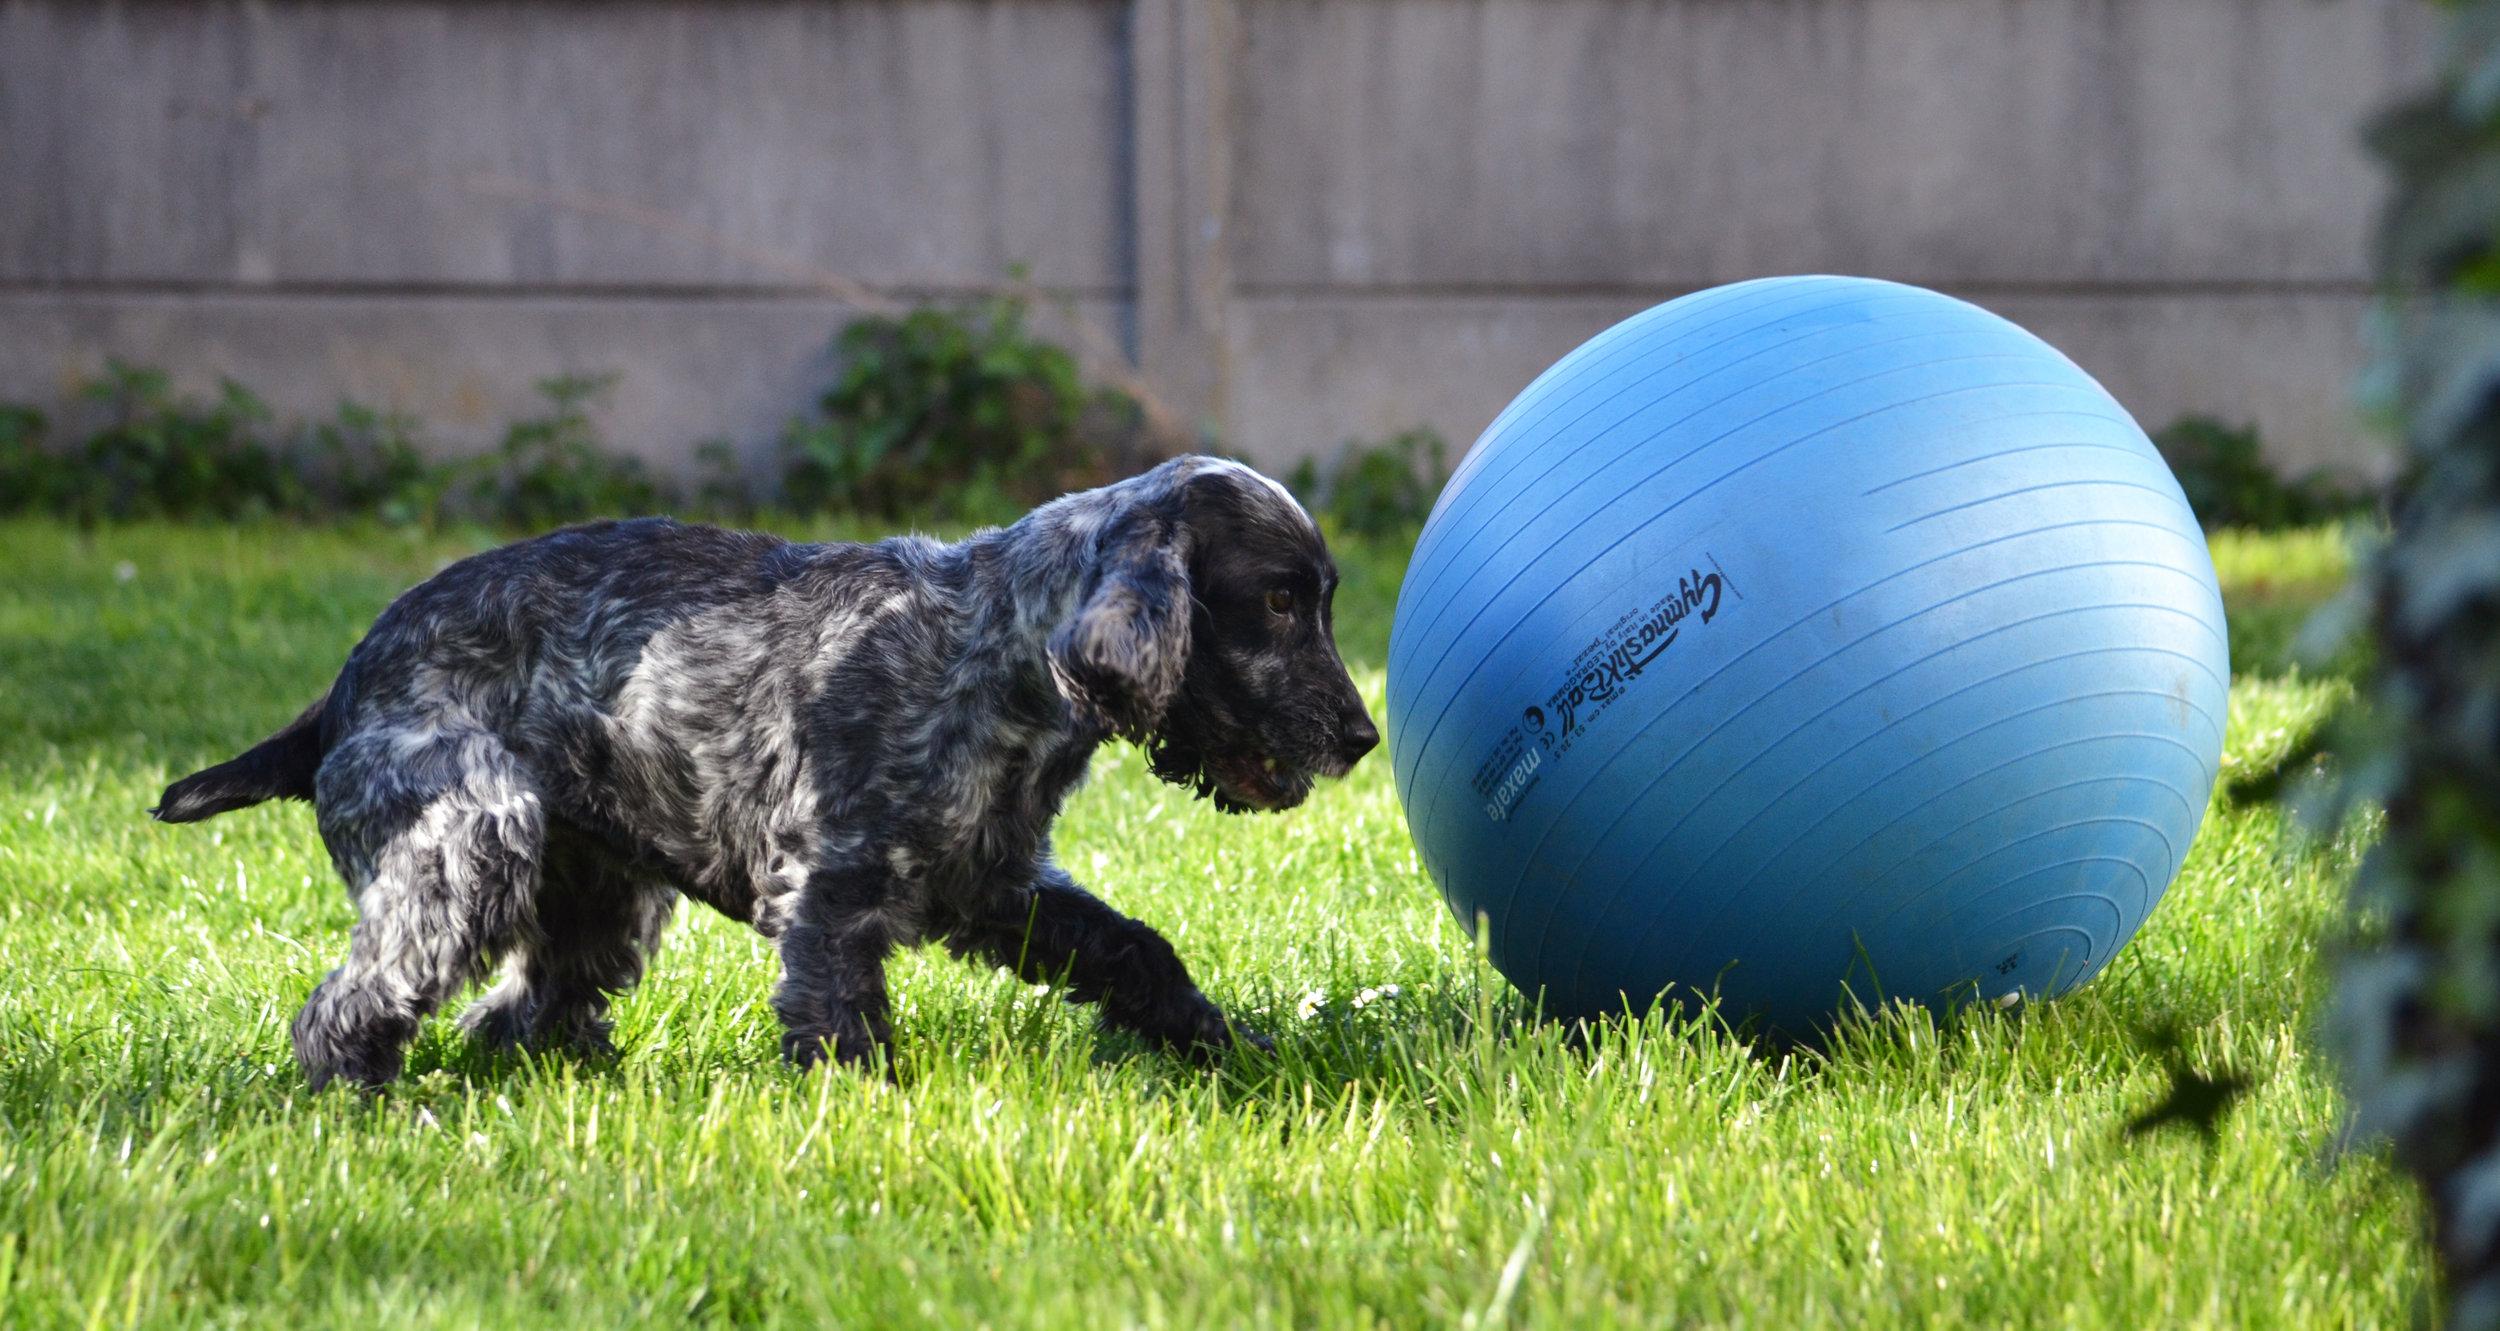 muzo-lyon-chien-treibball-sport-ballon-cerise.jpg